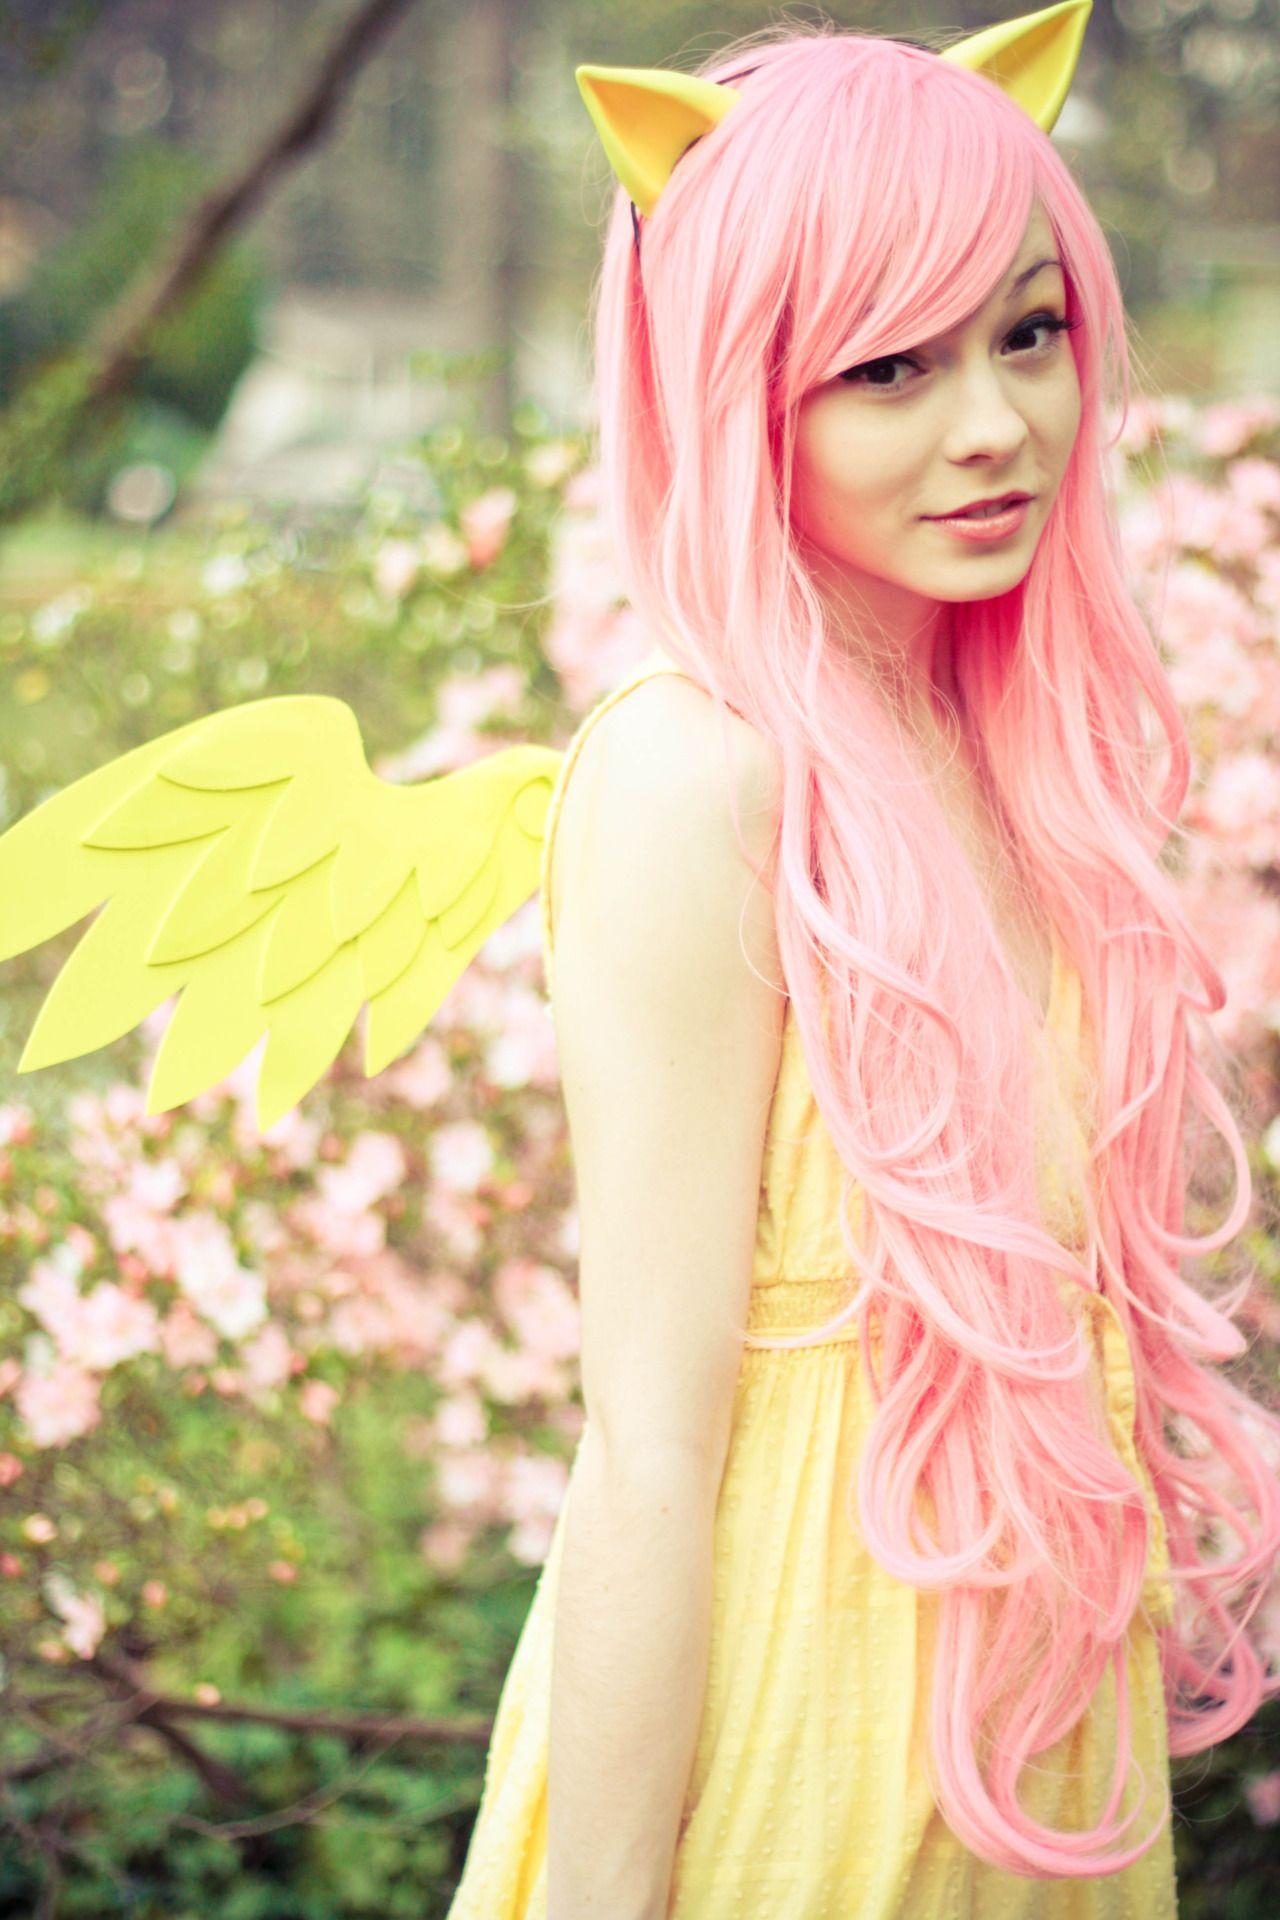 best hair i've seen on a fluttershy   halloween/cosplay   pinterest